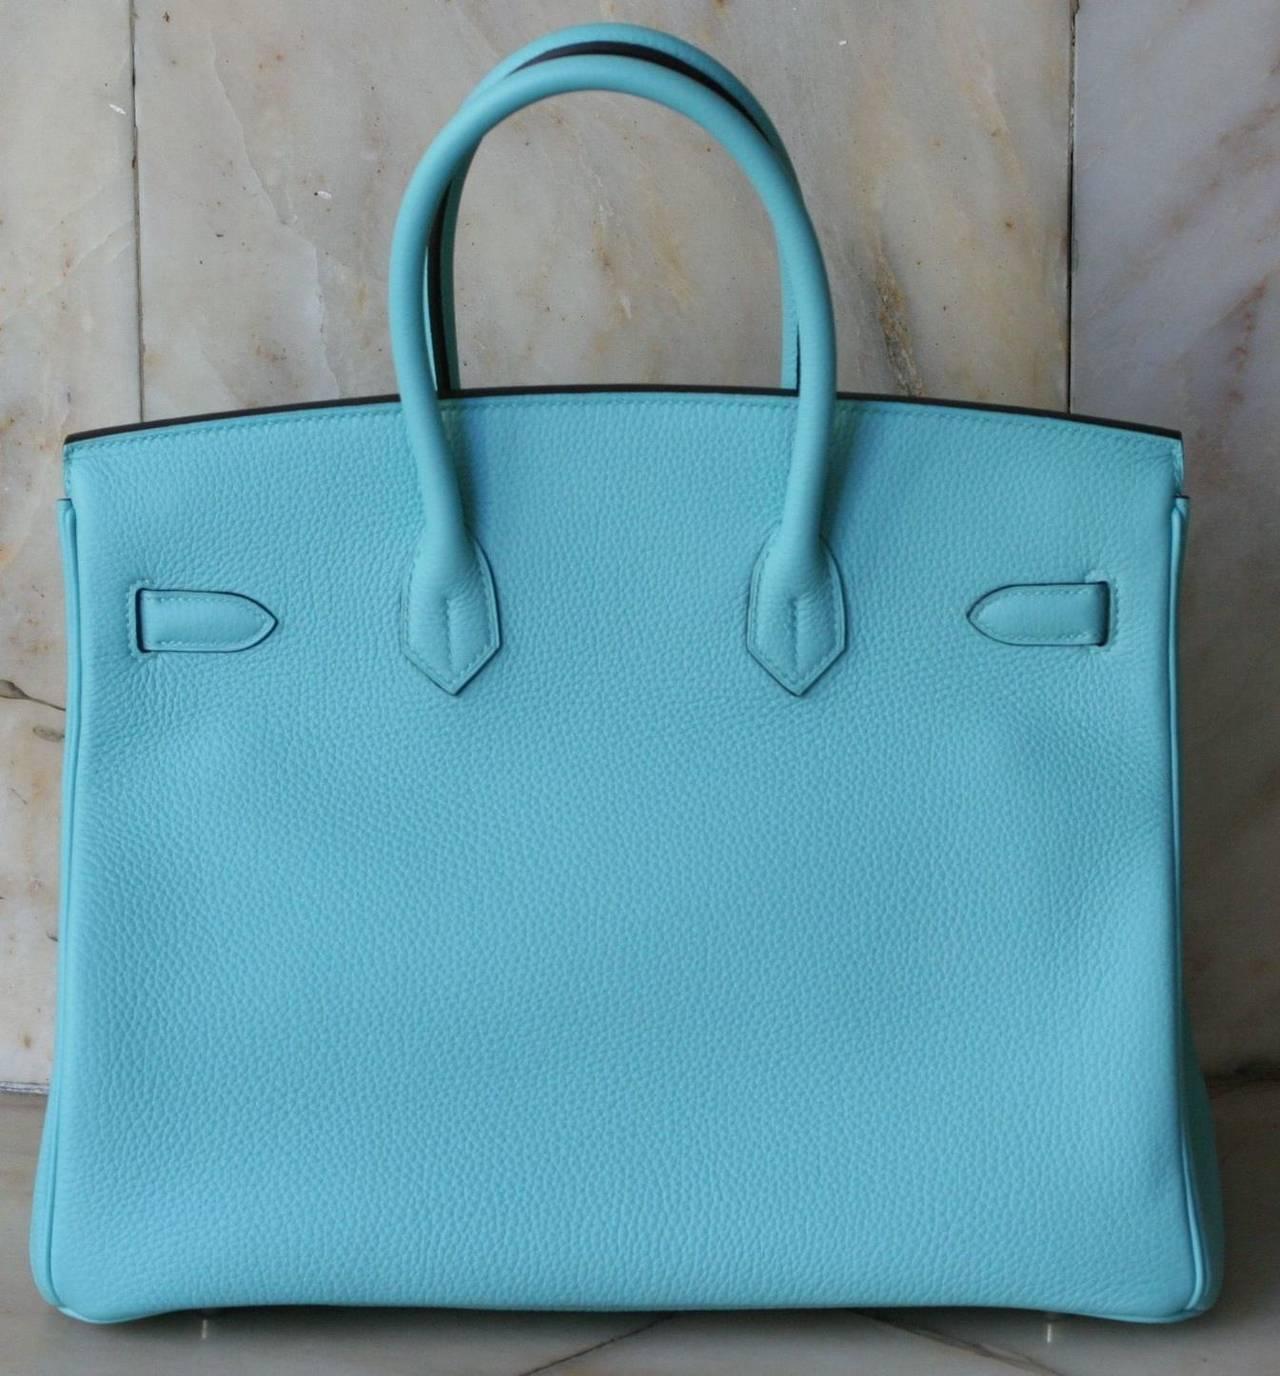 HERMES Birkin Atoll blue Togo '35 3